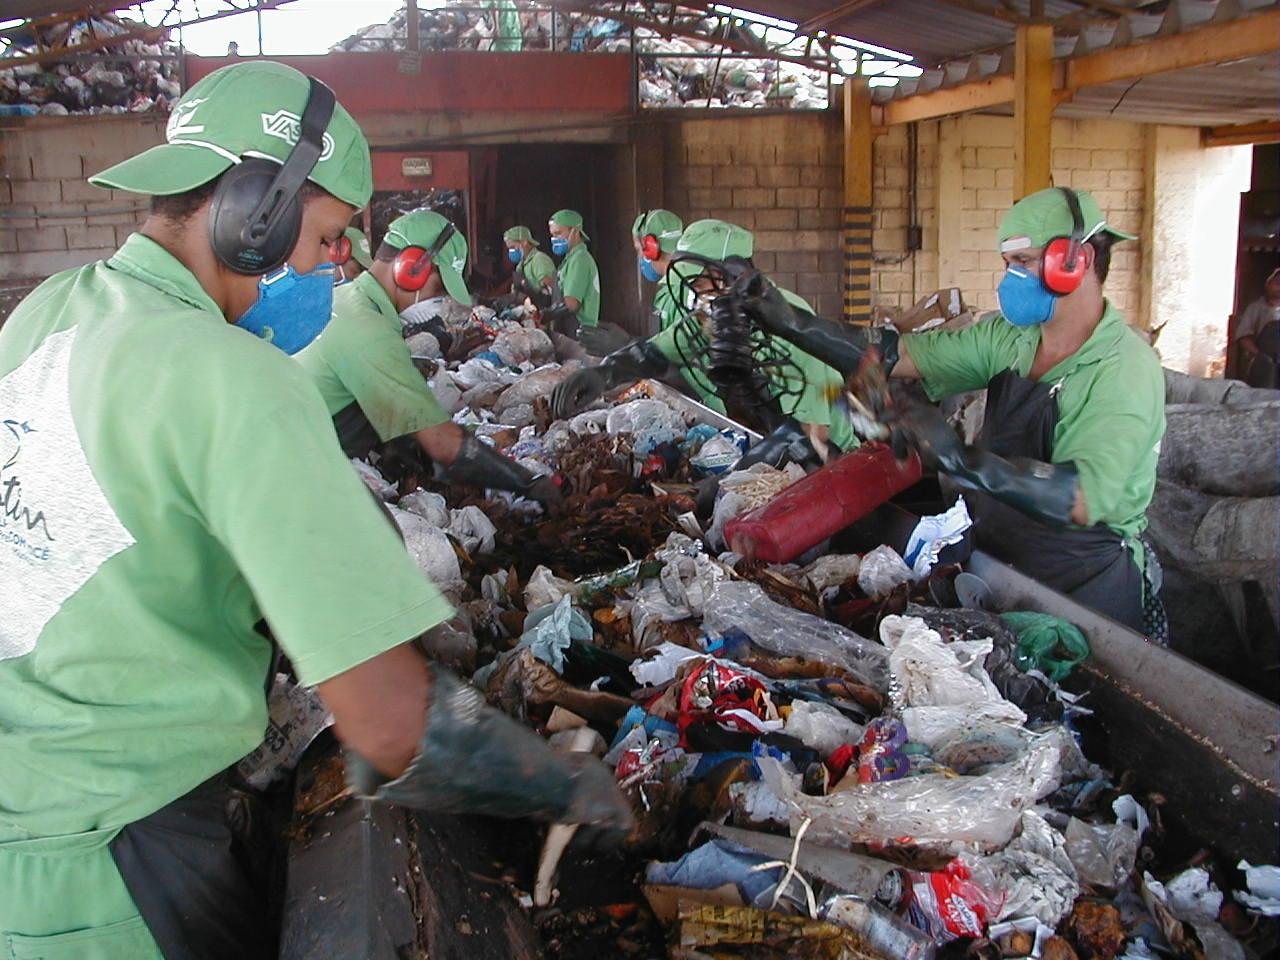 Workers sort through waste